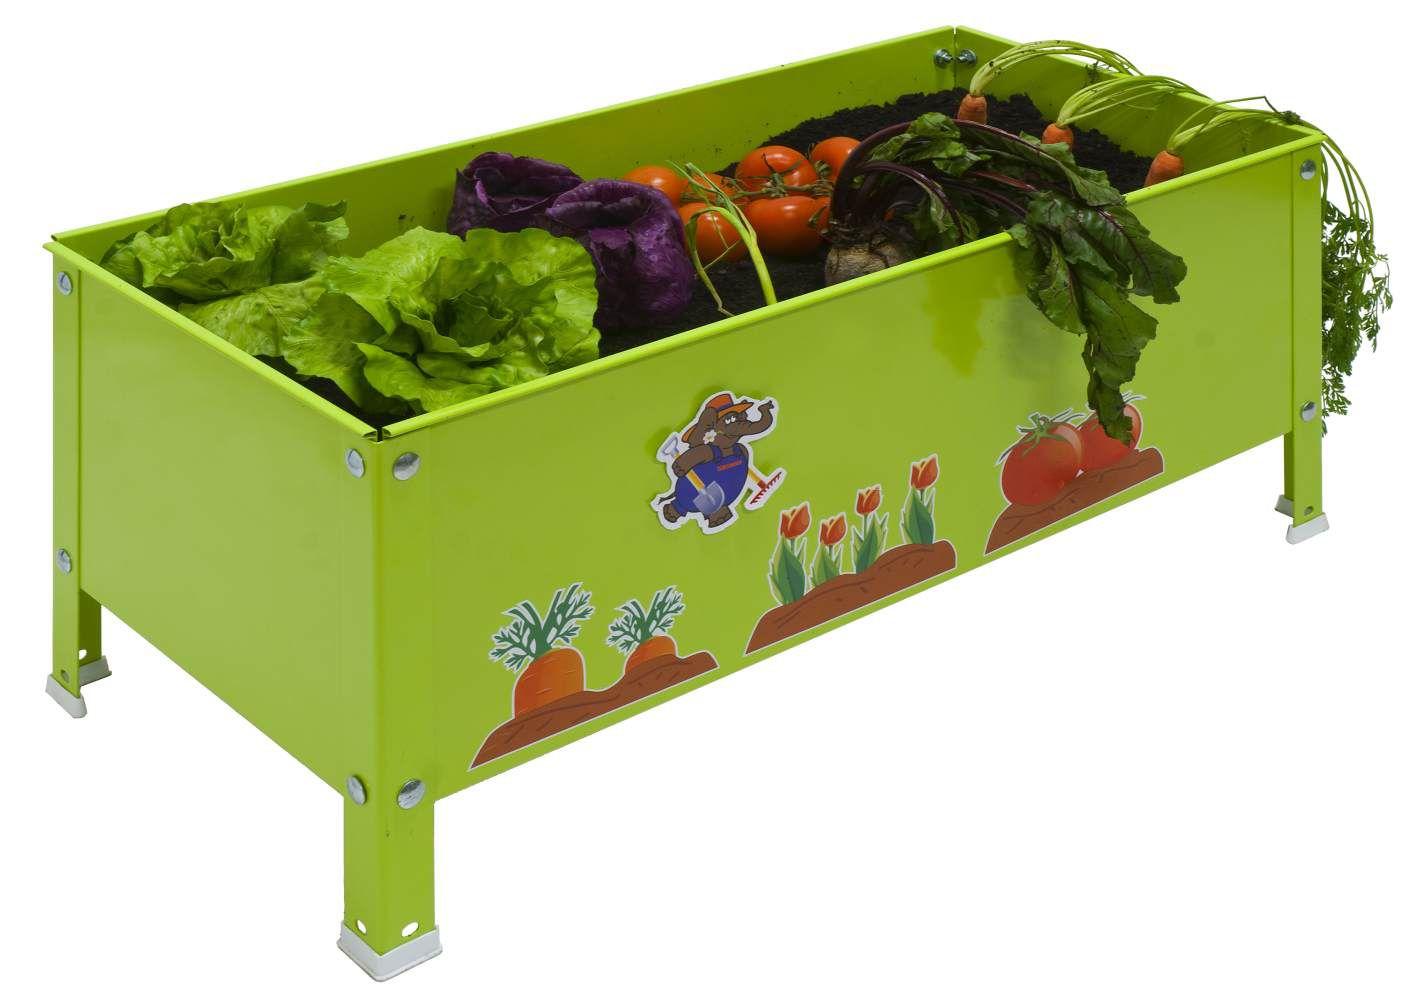 Pflanzbox Urban Garden Kid, Farbe: Grün, Maße: 41 x 70 x 30 cm (H x B x T)